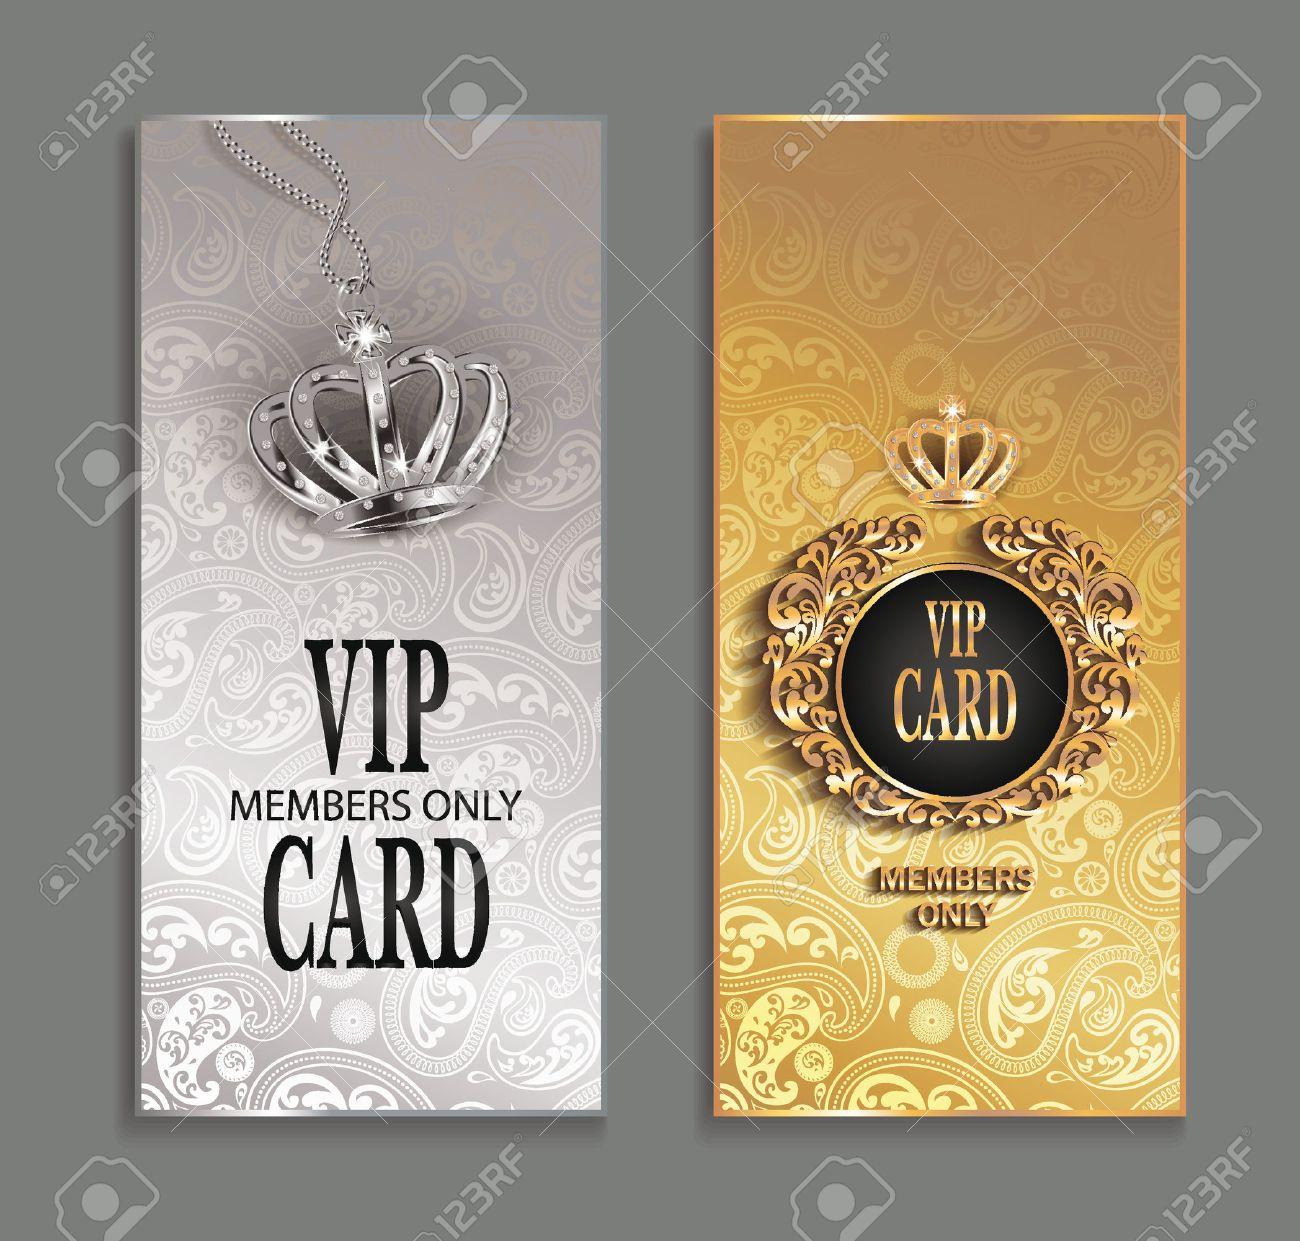 elegant invitation VIP cards with floral design - 39293666